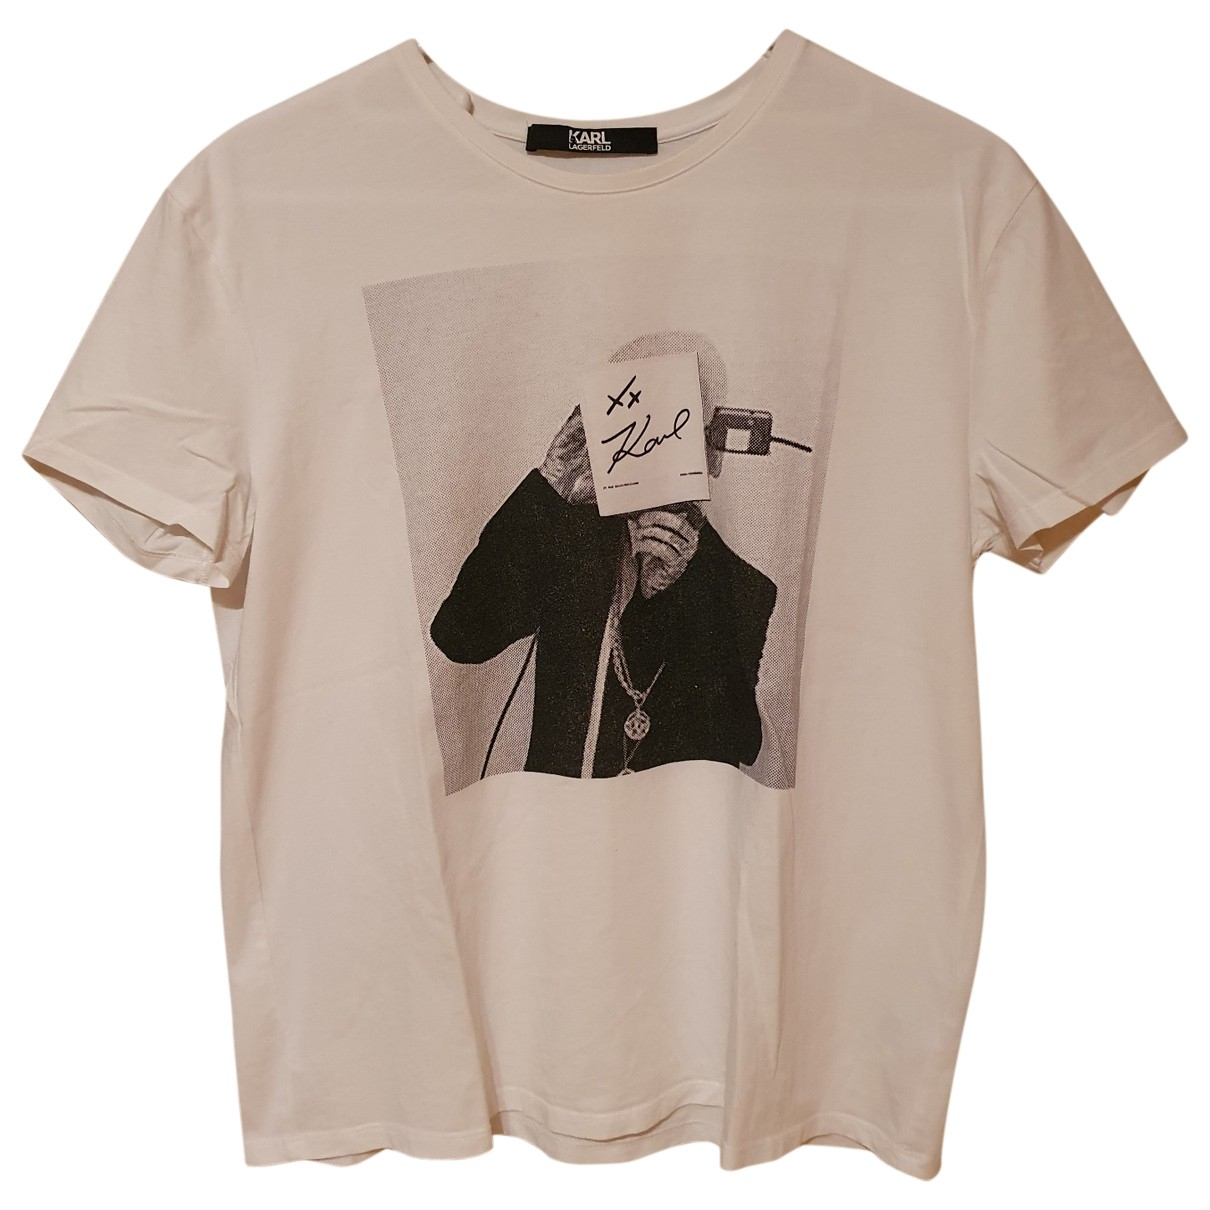 Karl Lagerfeld \N White Cotton  top for Women 36 FR